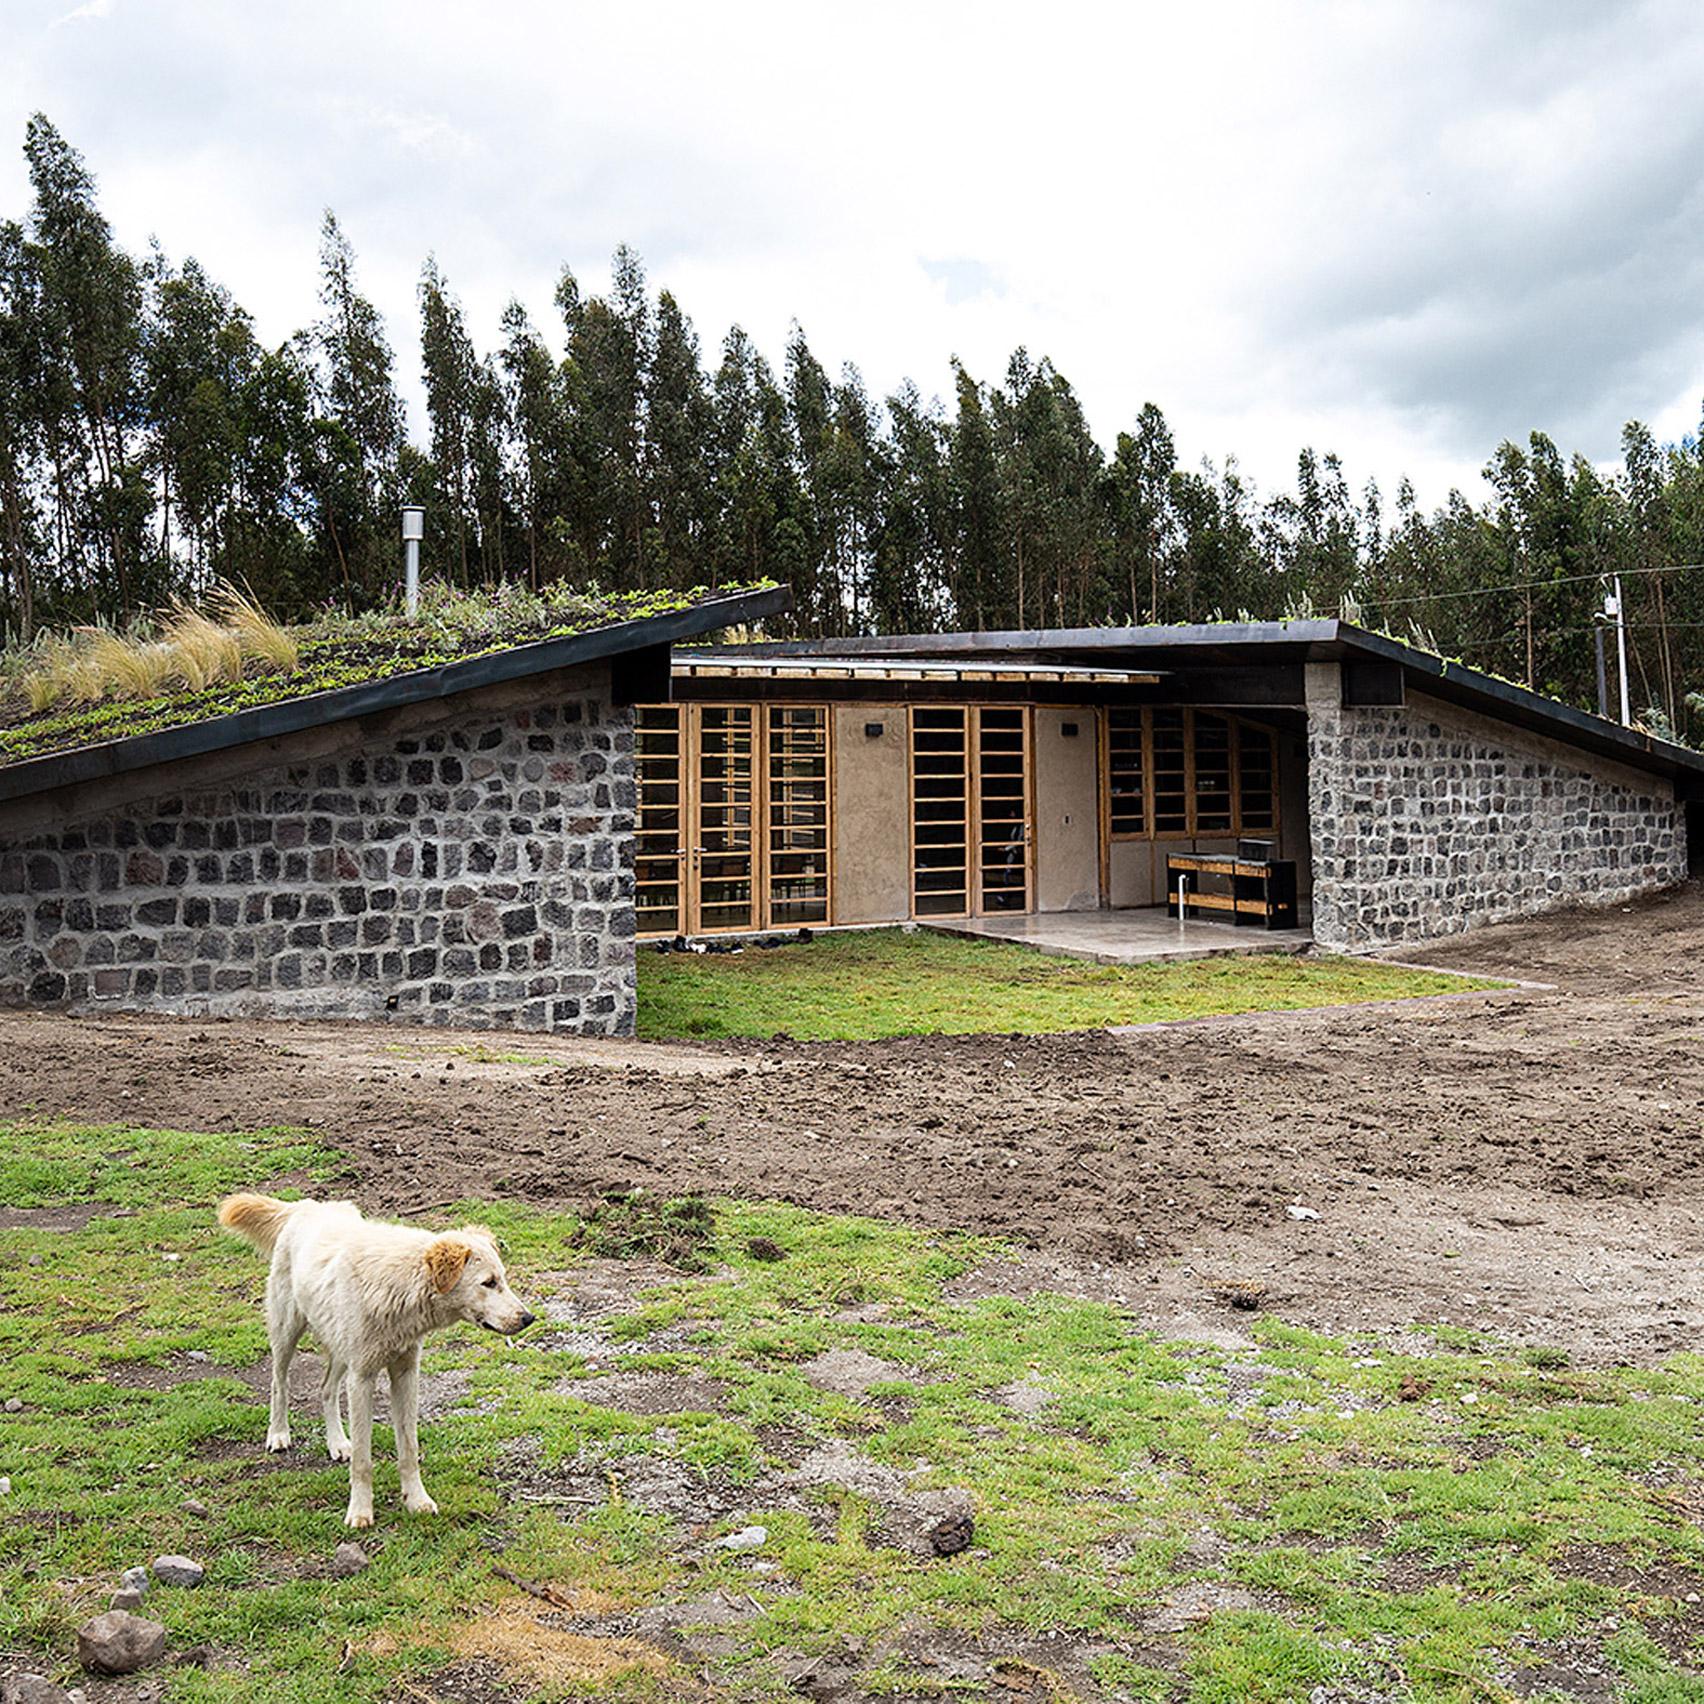 Rama Estudio embeds Casa Patios into rural Ecuadorian landscape